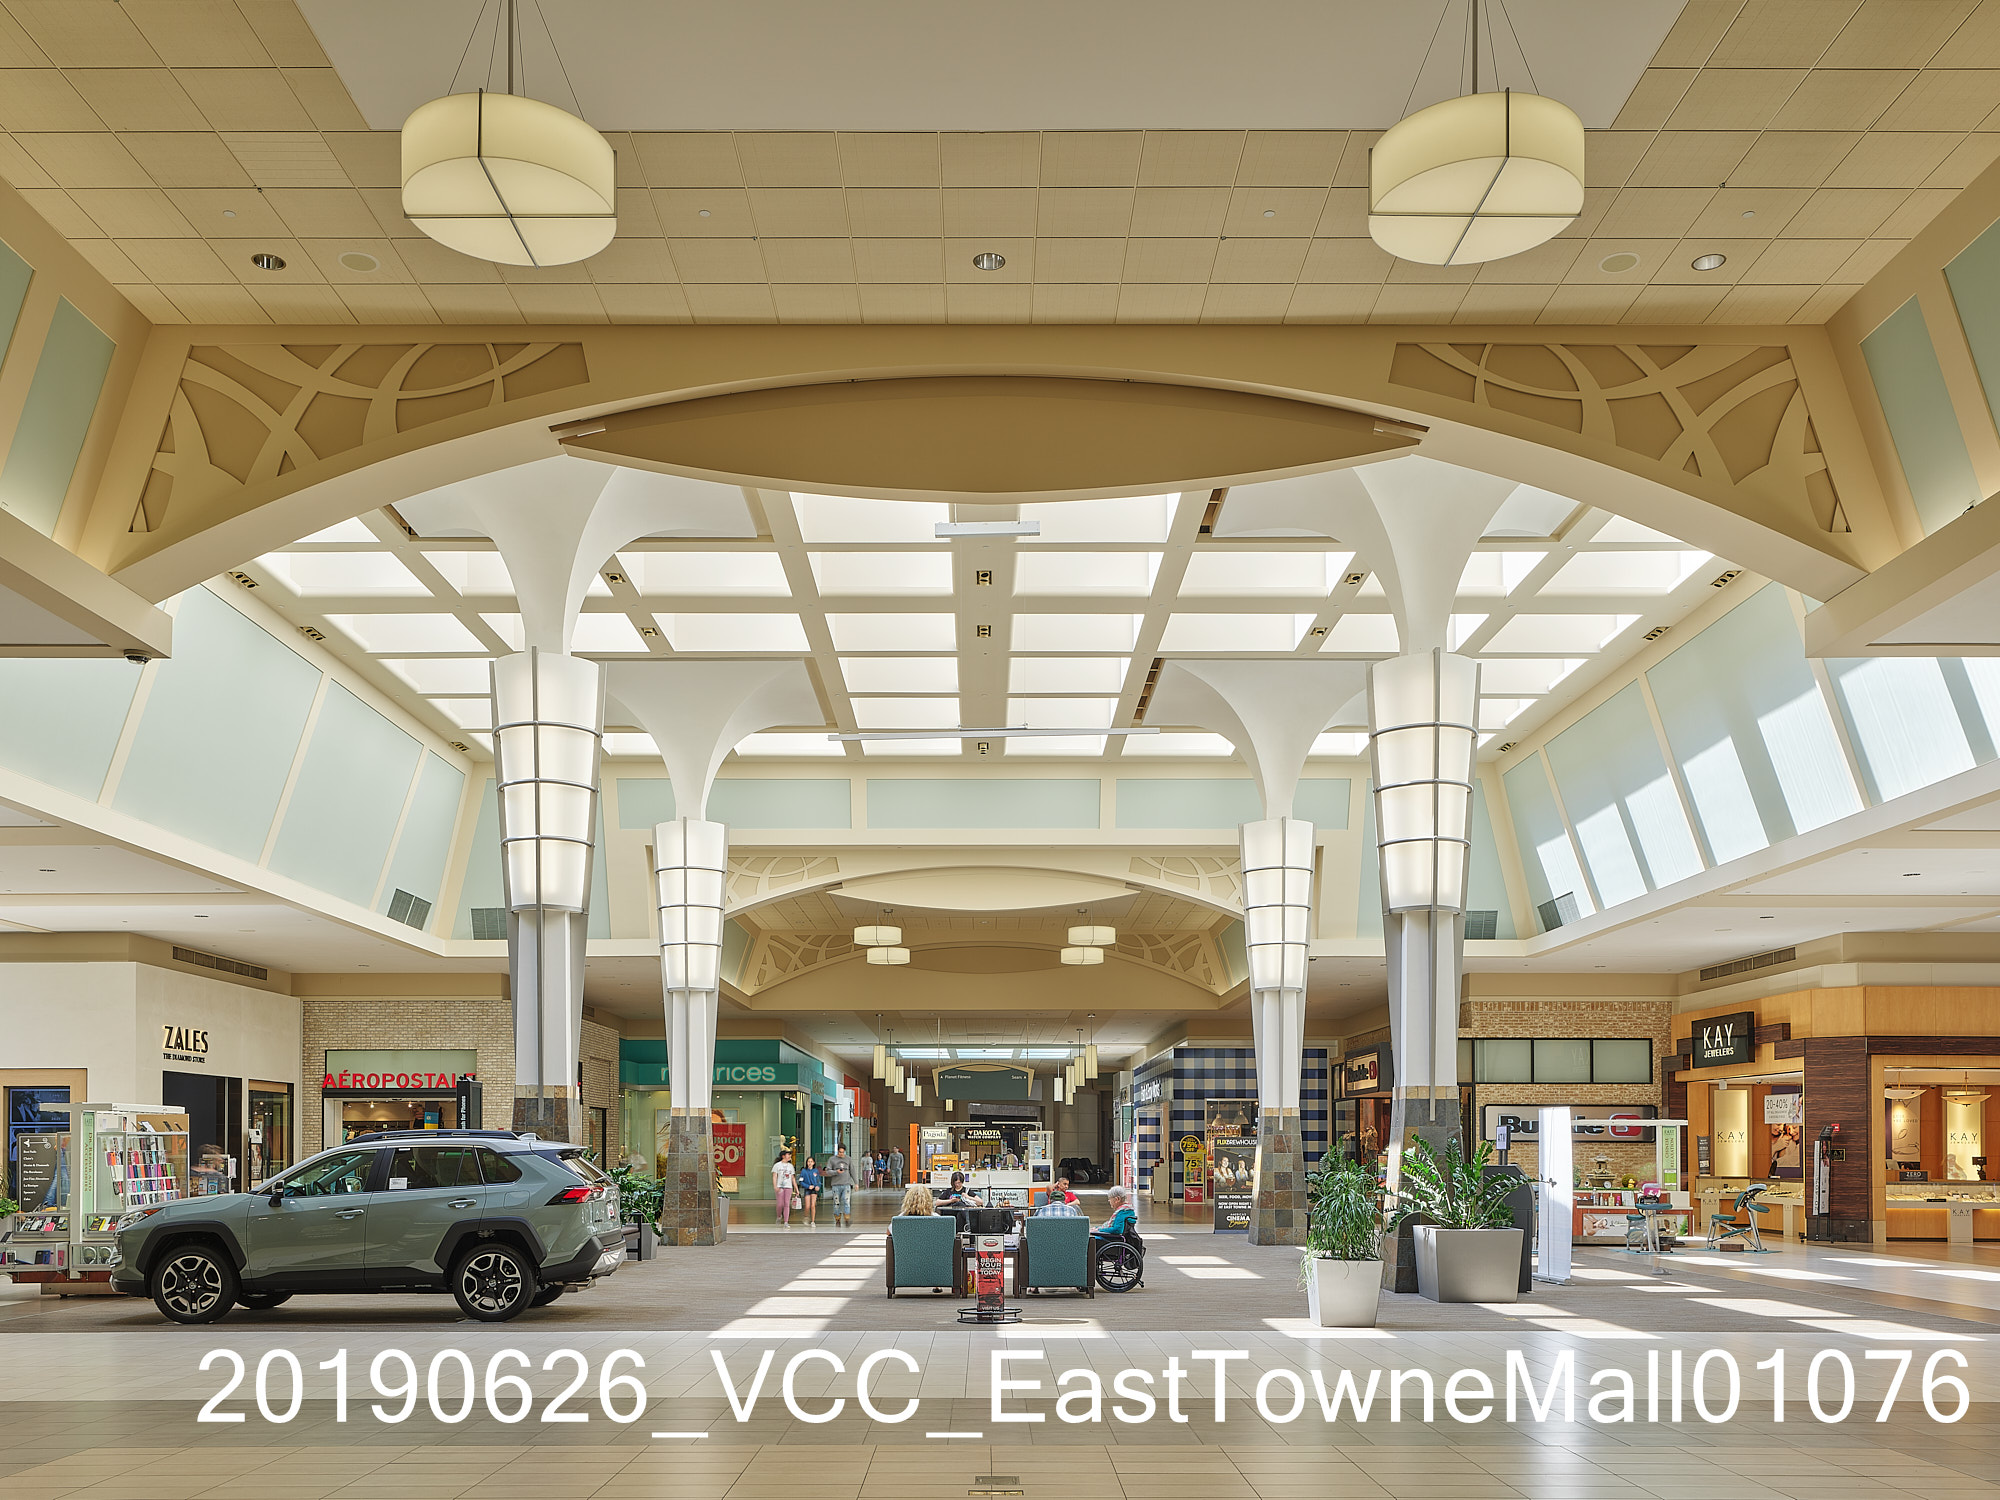 20190626_VCC_EastTowneMall01076.jpg